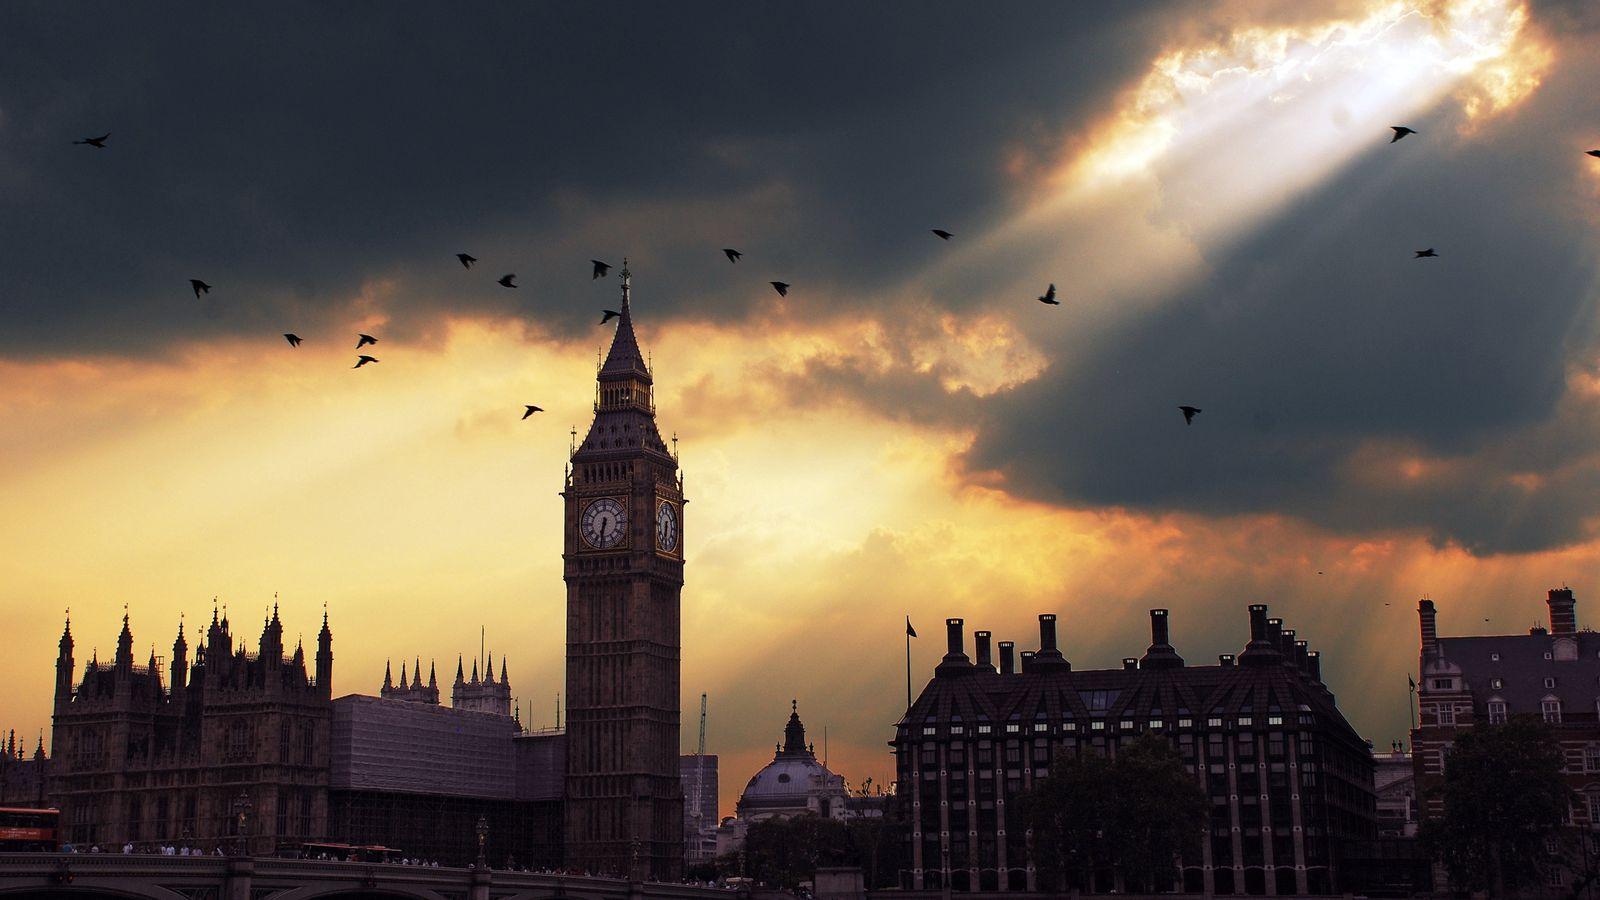 1600x900 Wallpaper london, big ben, sunset, shadow, sky